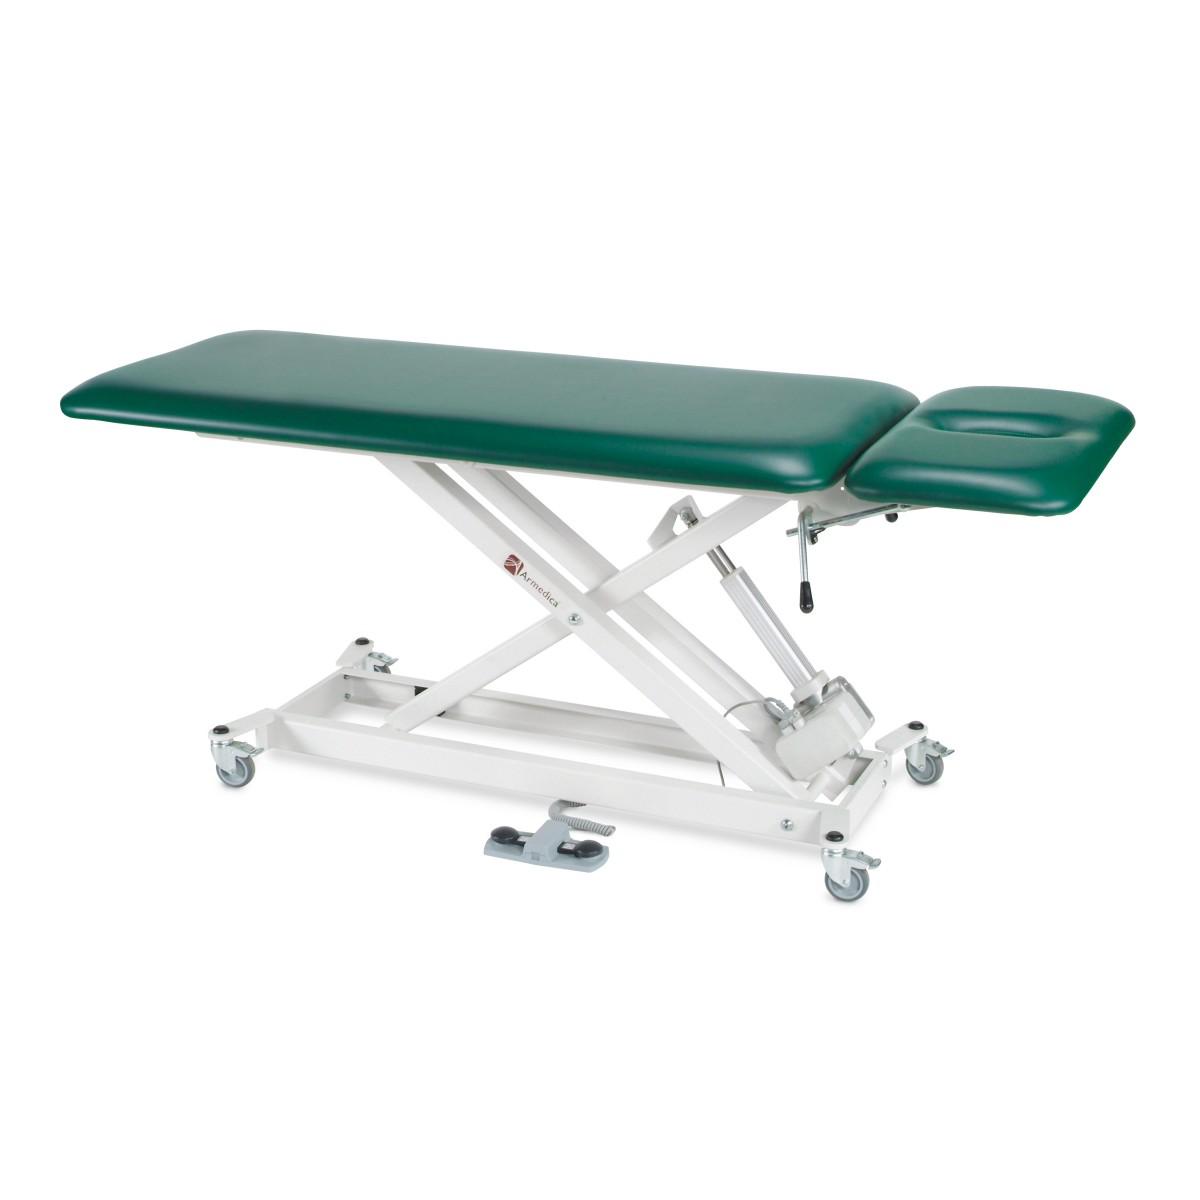 Armedica AM-SX 2000 treatment table